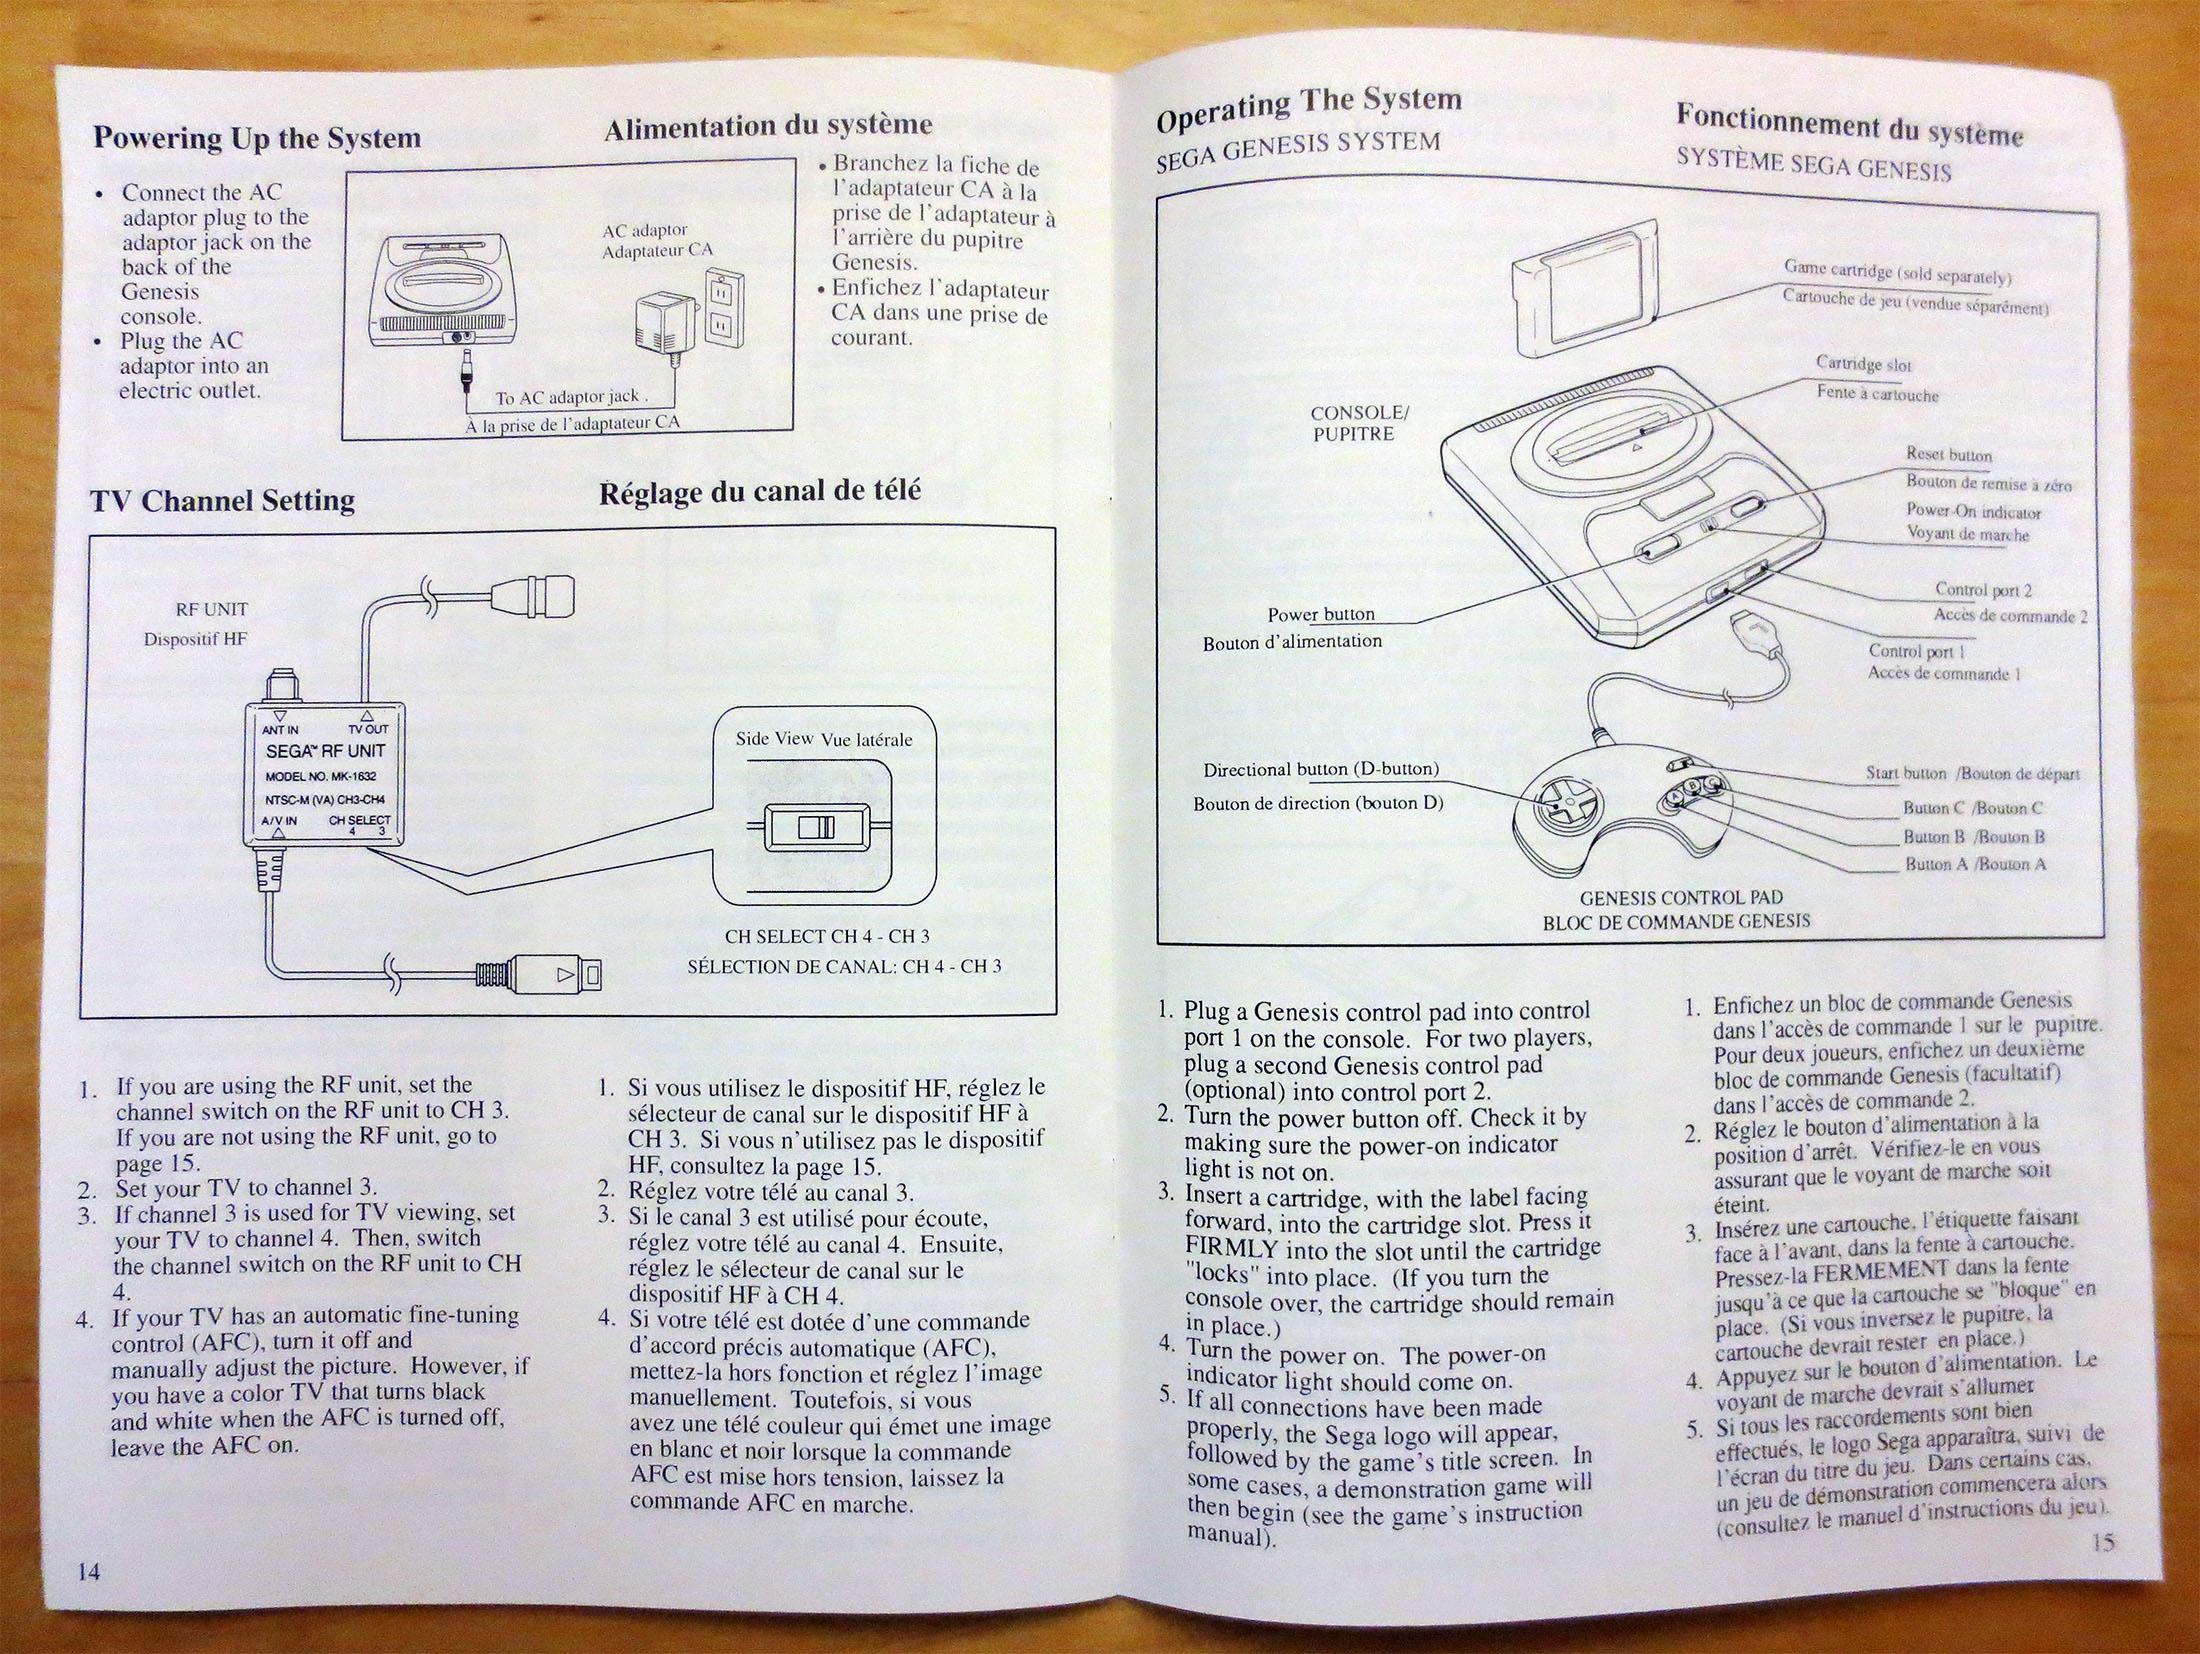 sega genesis console manual 02 retro megabit rh retromegabit com sega genesis instruction manual sega genesis manuals online